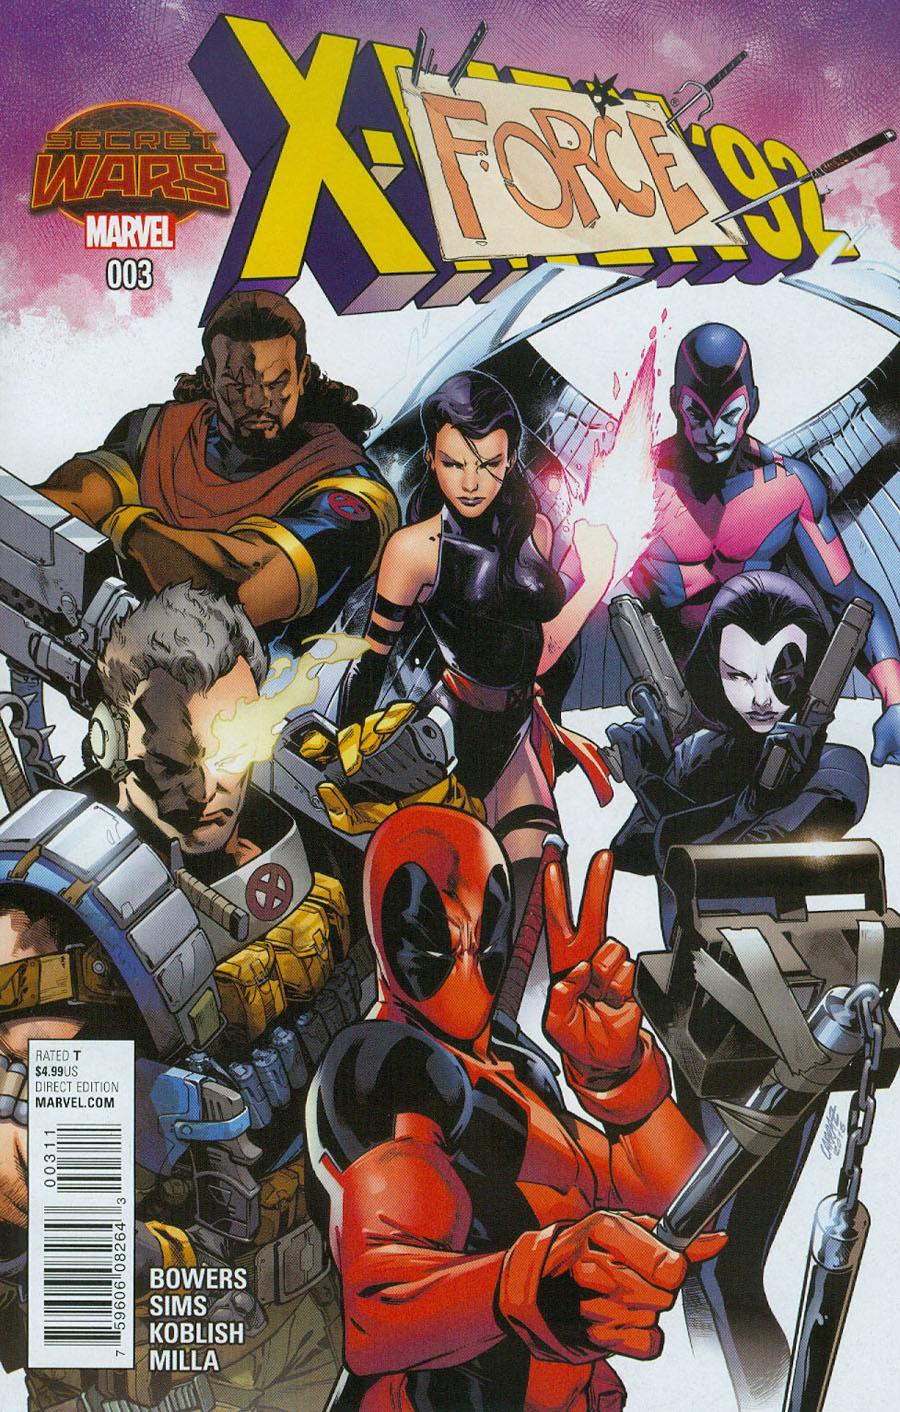 X-Men 92 #3 Cover A Regular Pepe Larraz Cover (Secret Wars Warzones Tie-In)